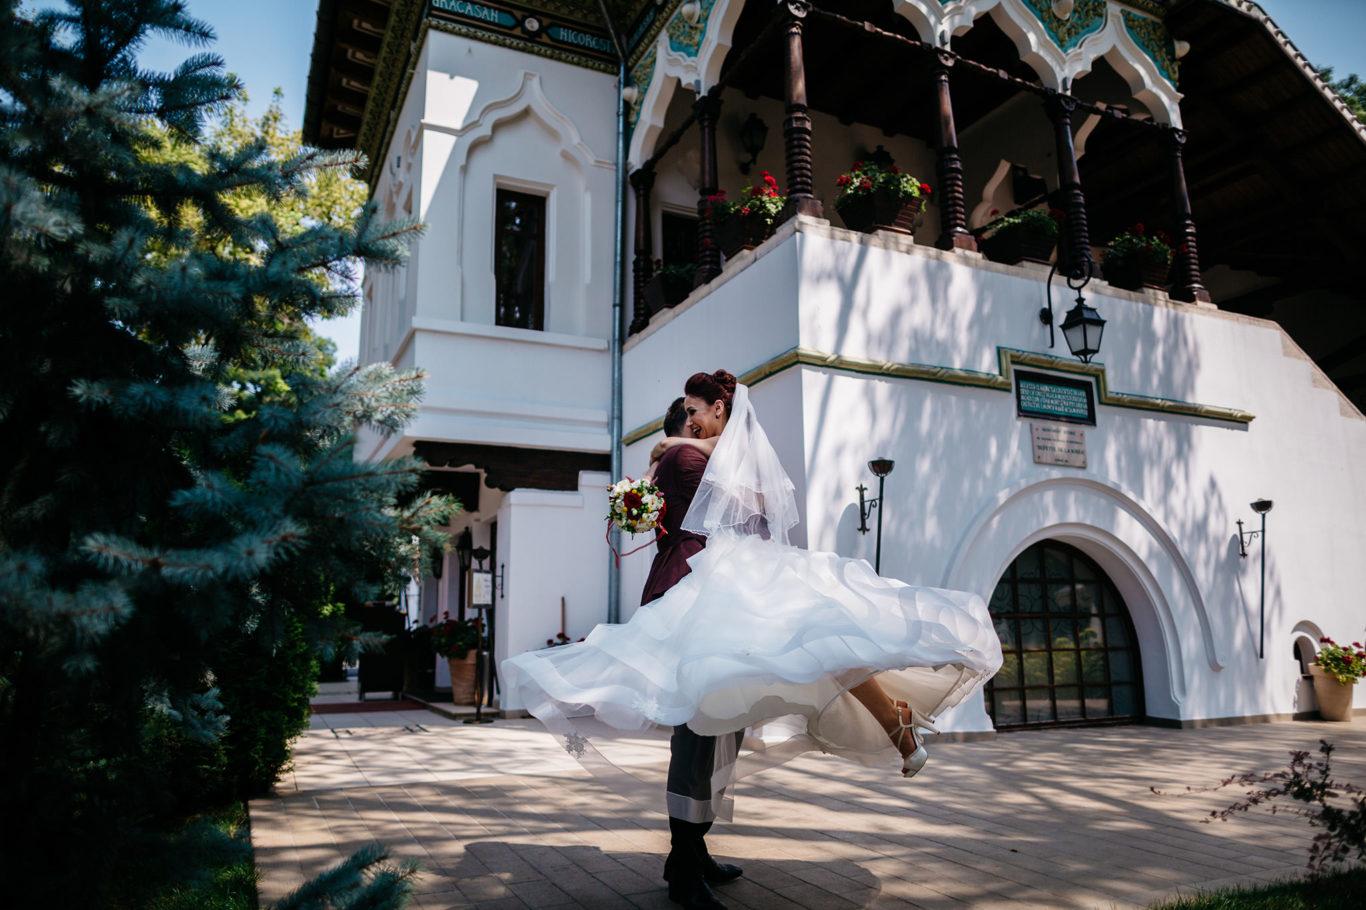 0216-fotografie-nunta-bucuresti-cristina-nicusor-fotograf-ciprian-dumitrescu-dc1_0042